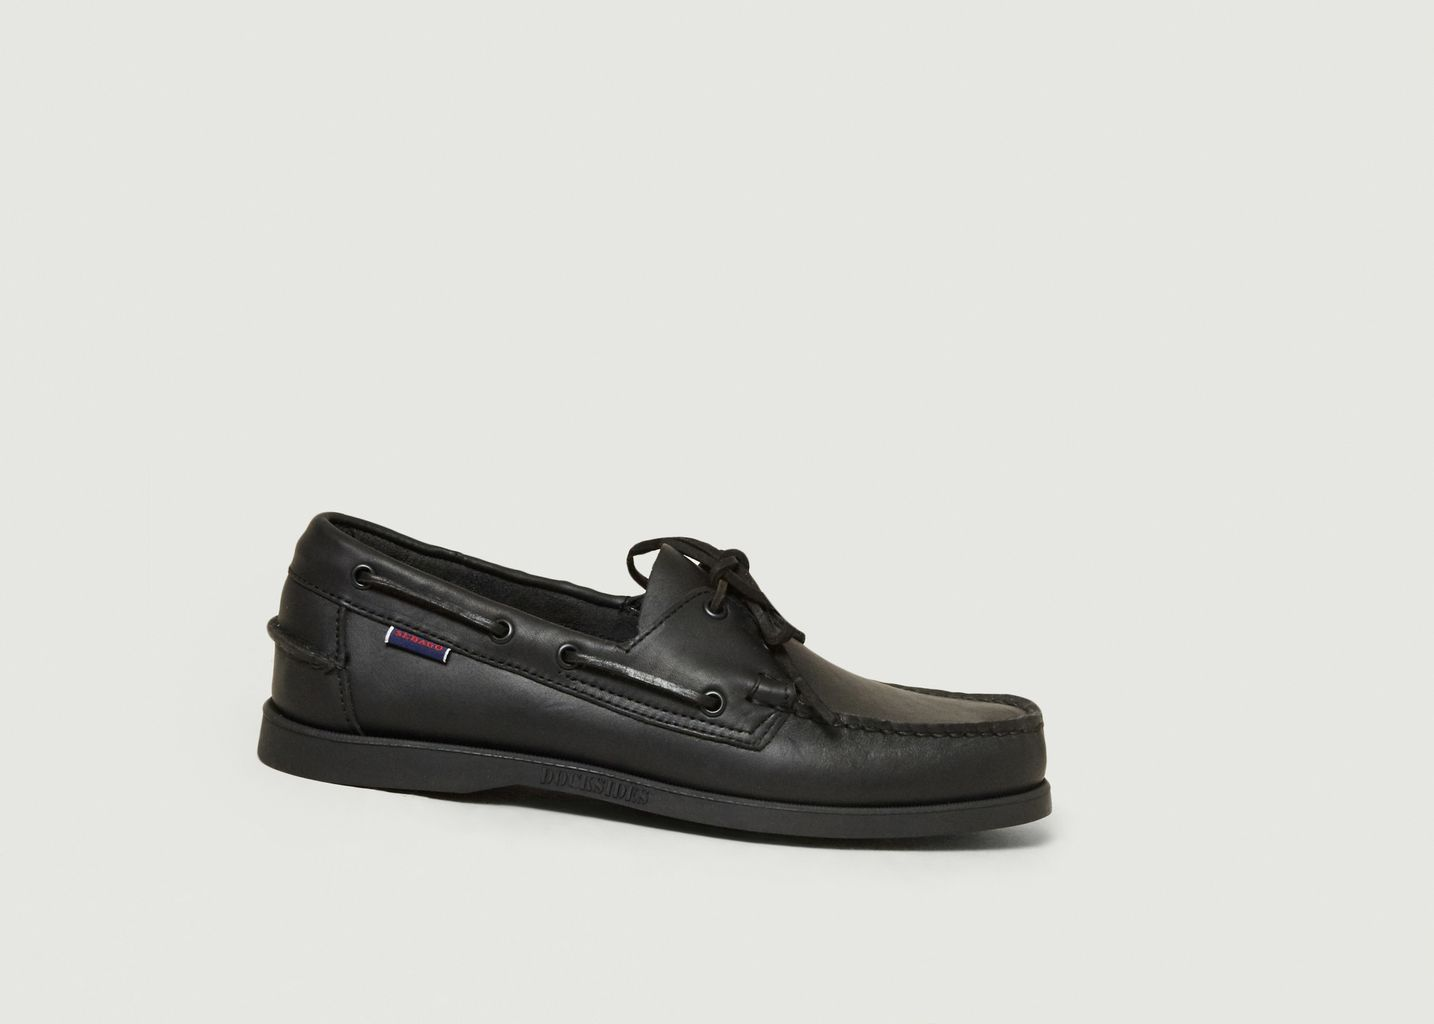 Chaussures bateau en cuir Portland - Sebago